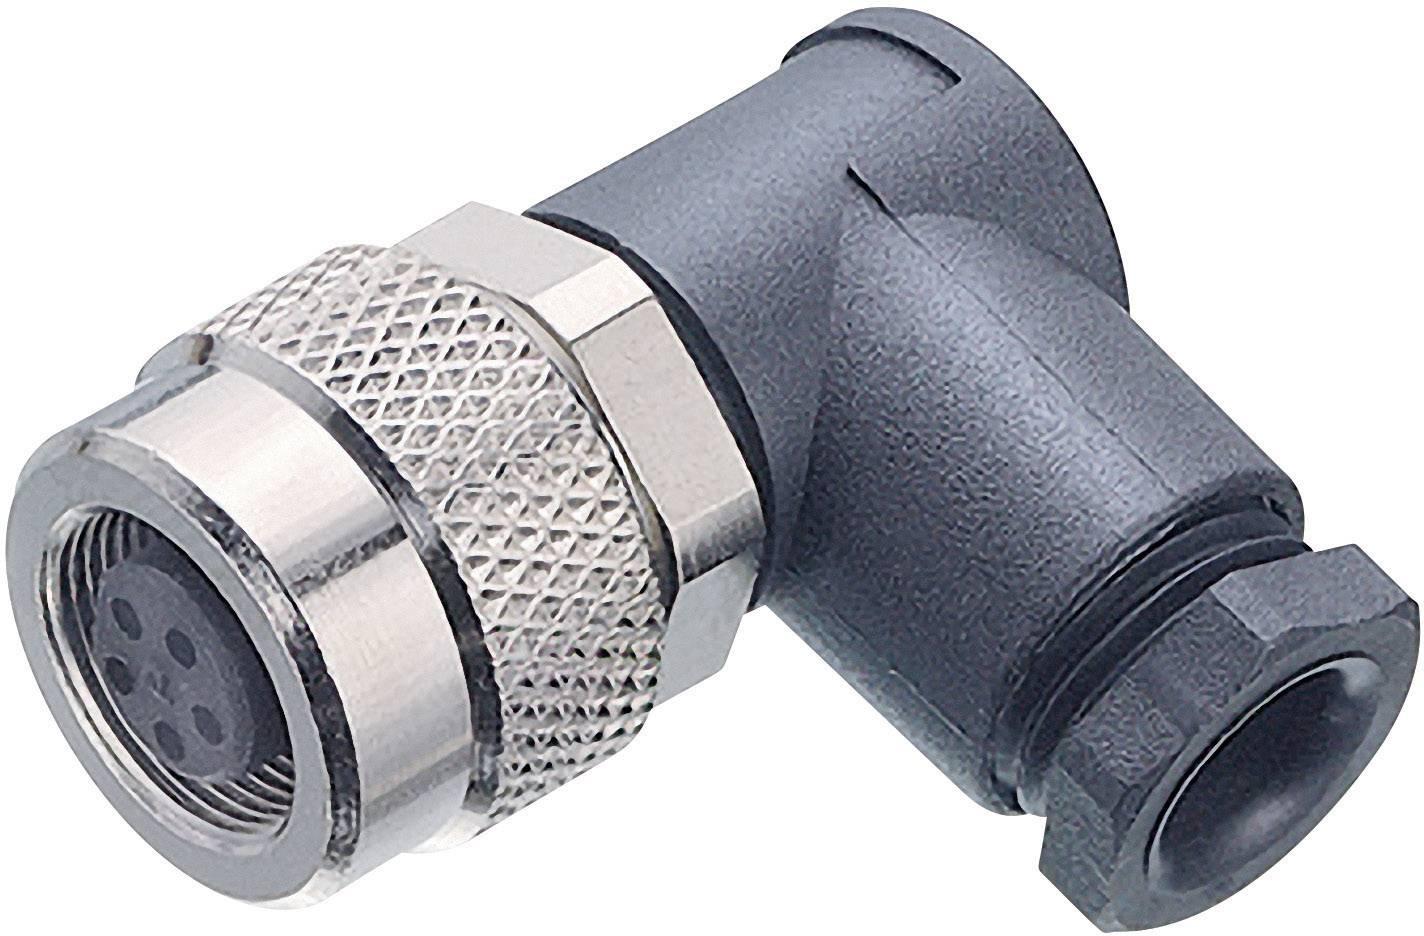 Guľatý konektor submin. Binder 99-0426-70-08, 8-pól., uhlová zásuvka, 3,5 - 5 mm, IP67